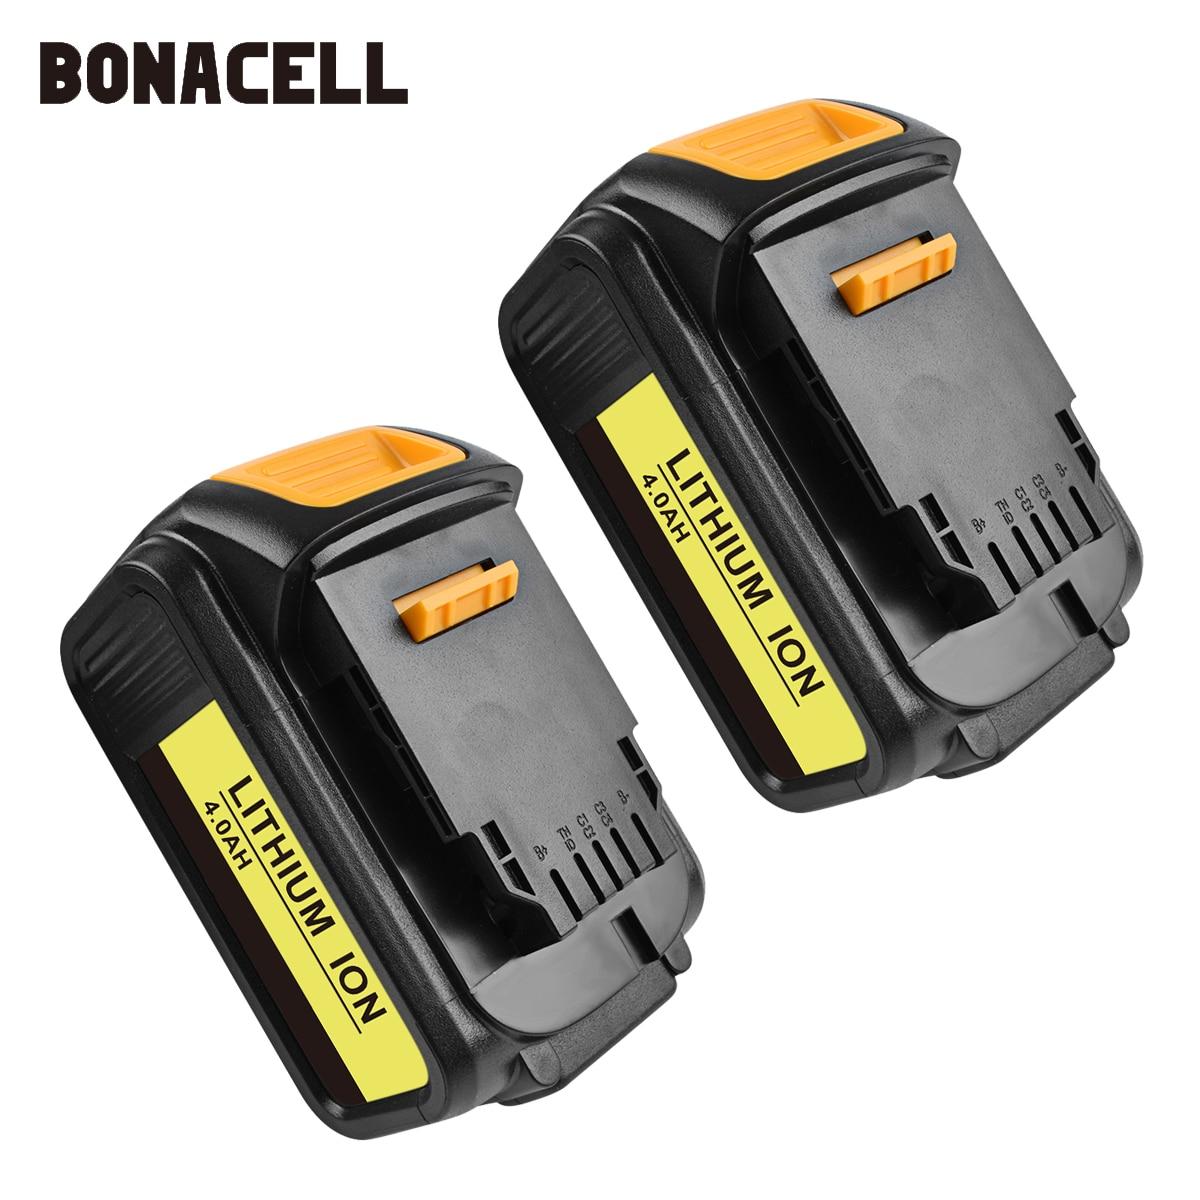 Bonacell For DeWalt 18V 4000mAh Battery Power Tools Batteries Replacement DCB181 DCB182 DCD780 DCD785 DCD795 L10